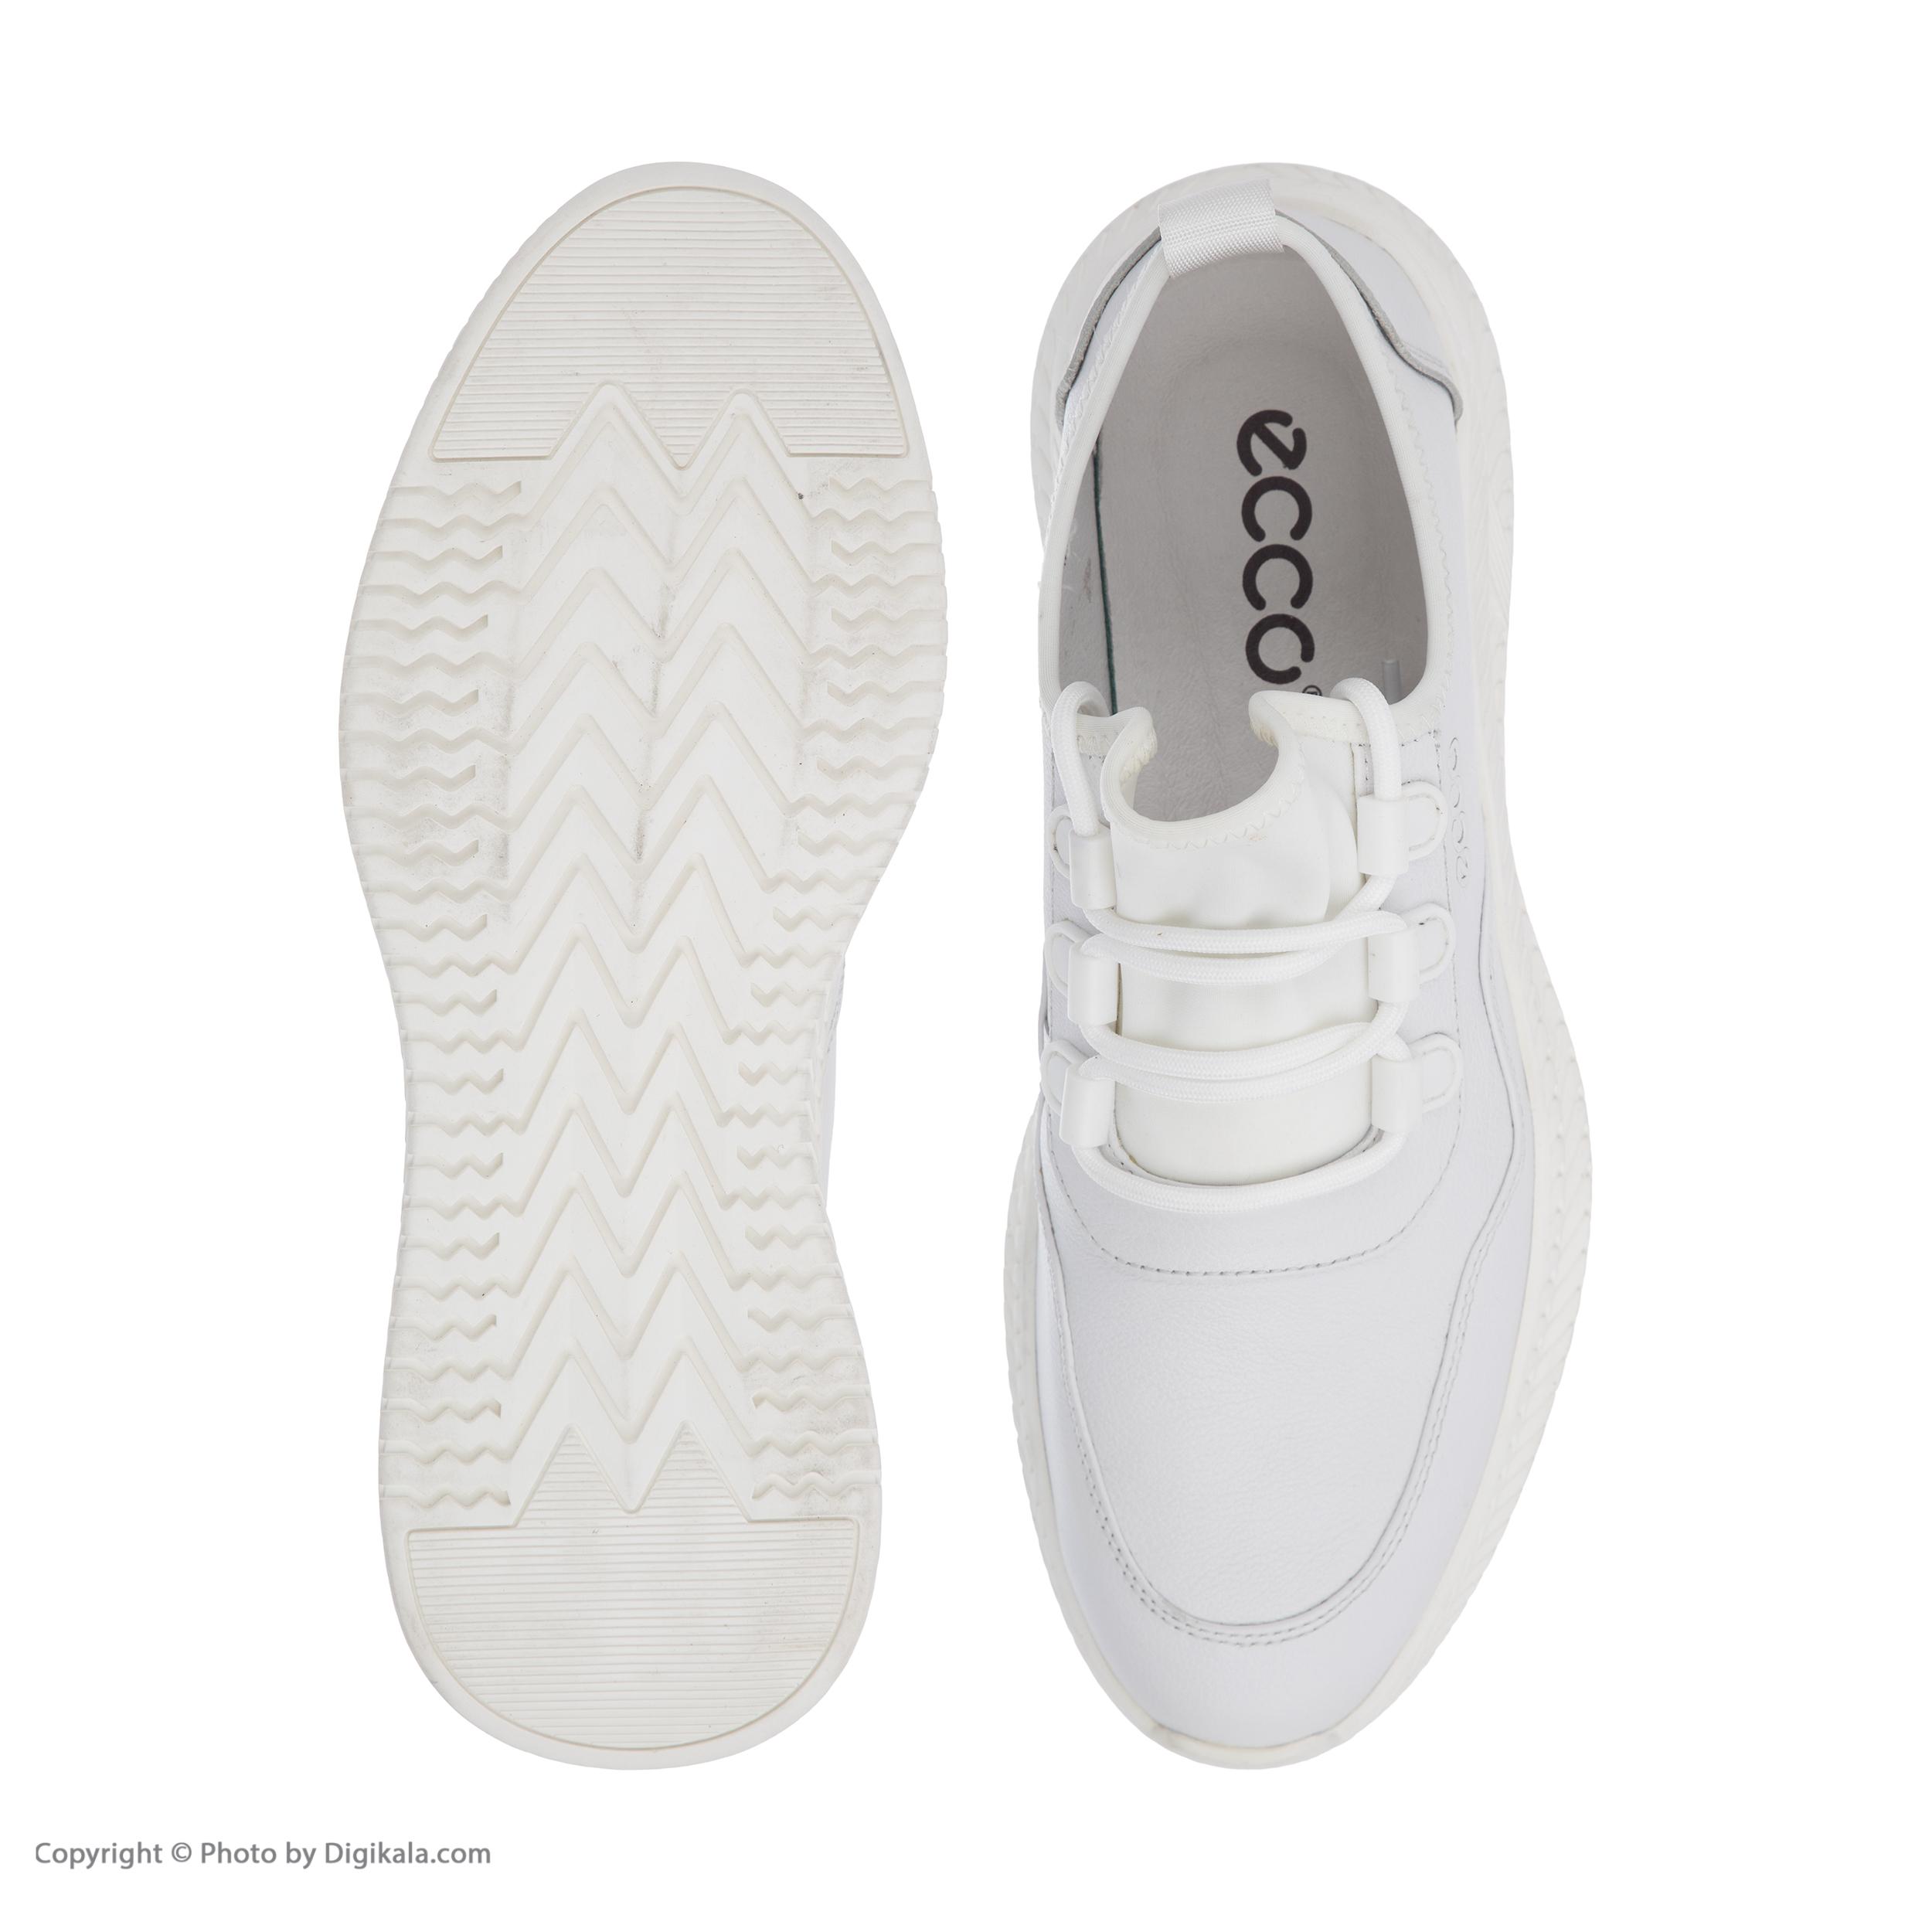 قیمت خرید کفش روزمره مردانه اکو کد s307_1 اورجینال